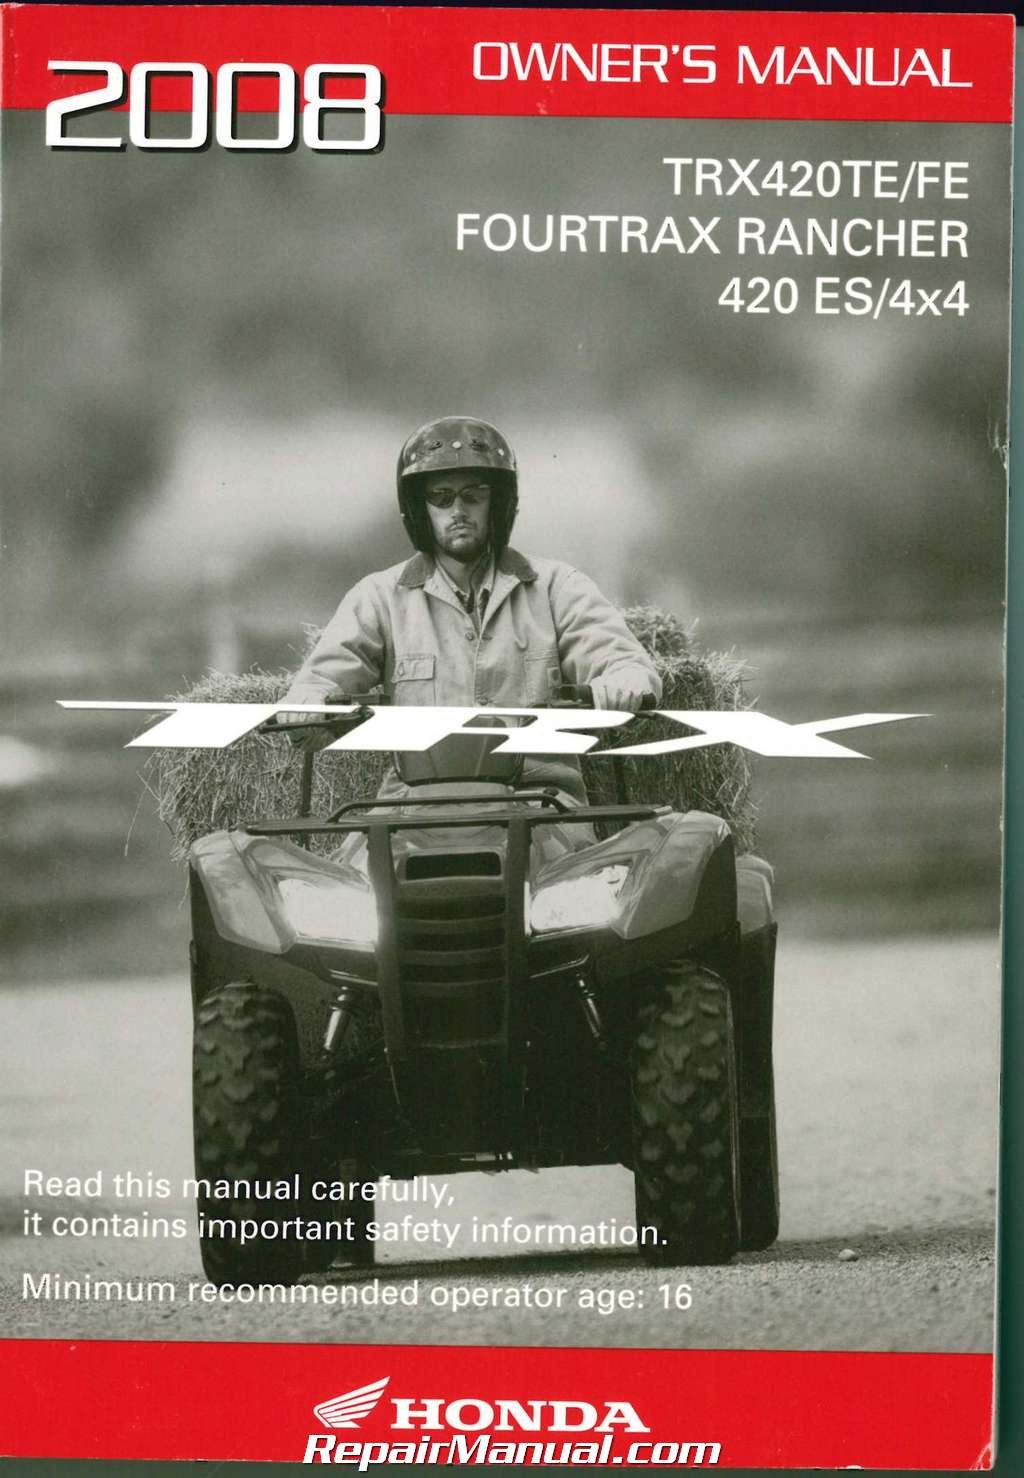 31HP4810 2008 Honda TRX420TE FE Fourtrax Rancher 420ES 4X4 ATV Owners Manual:  Manufacturer: Amazon.com: Books